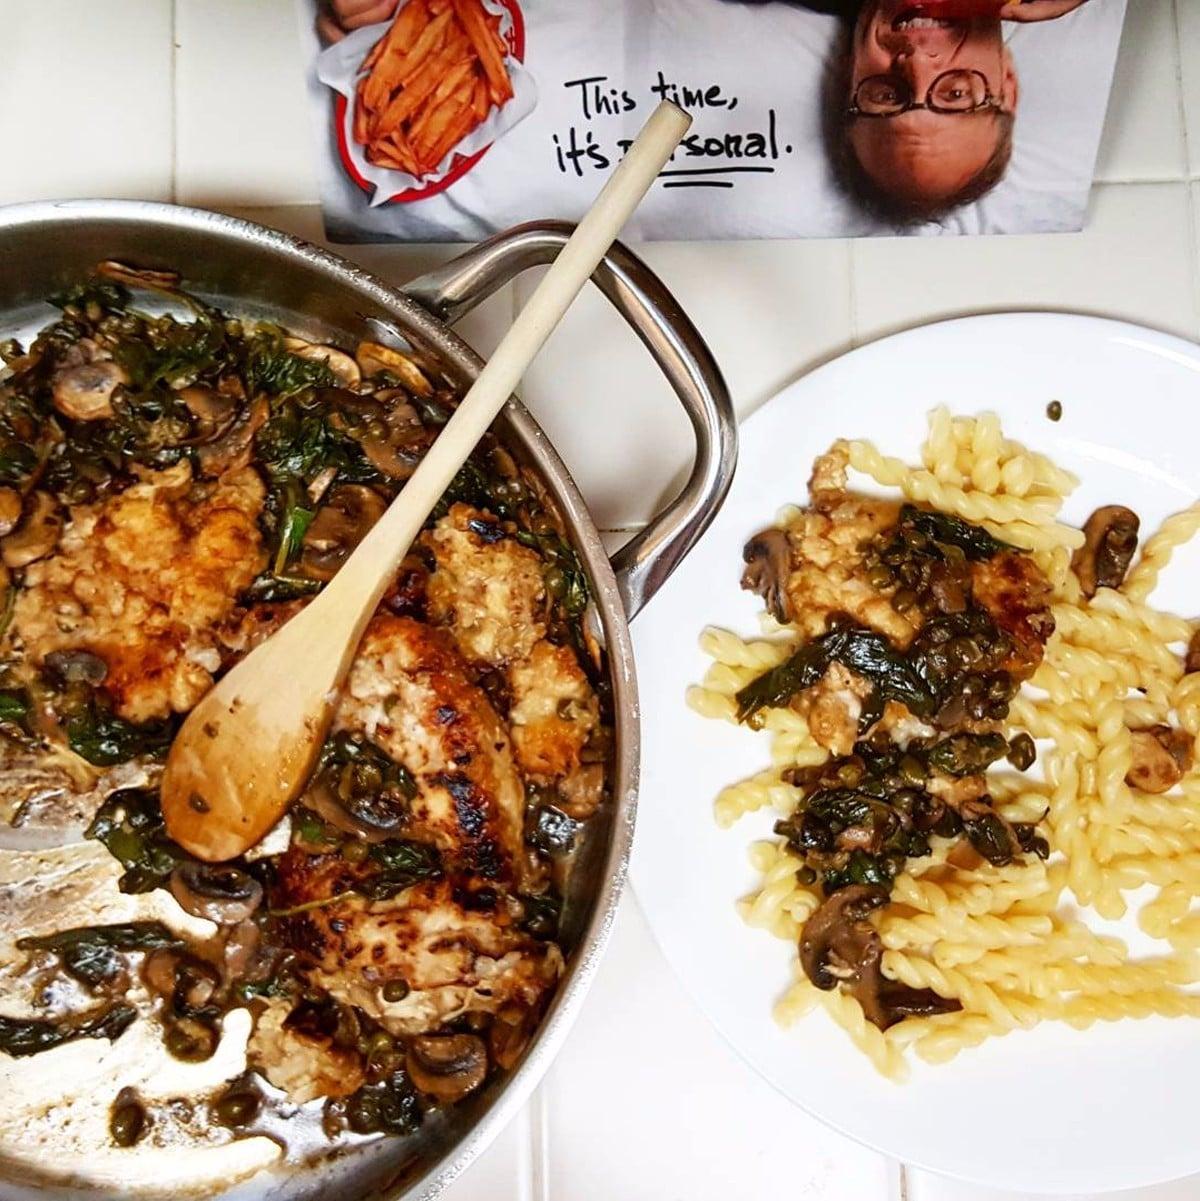 Everyday cook recipes from alton brown popsugar food forumfinder Images